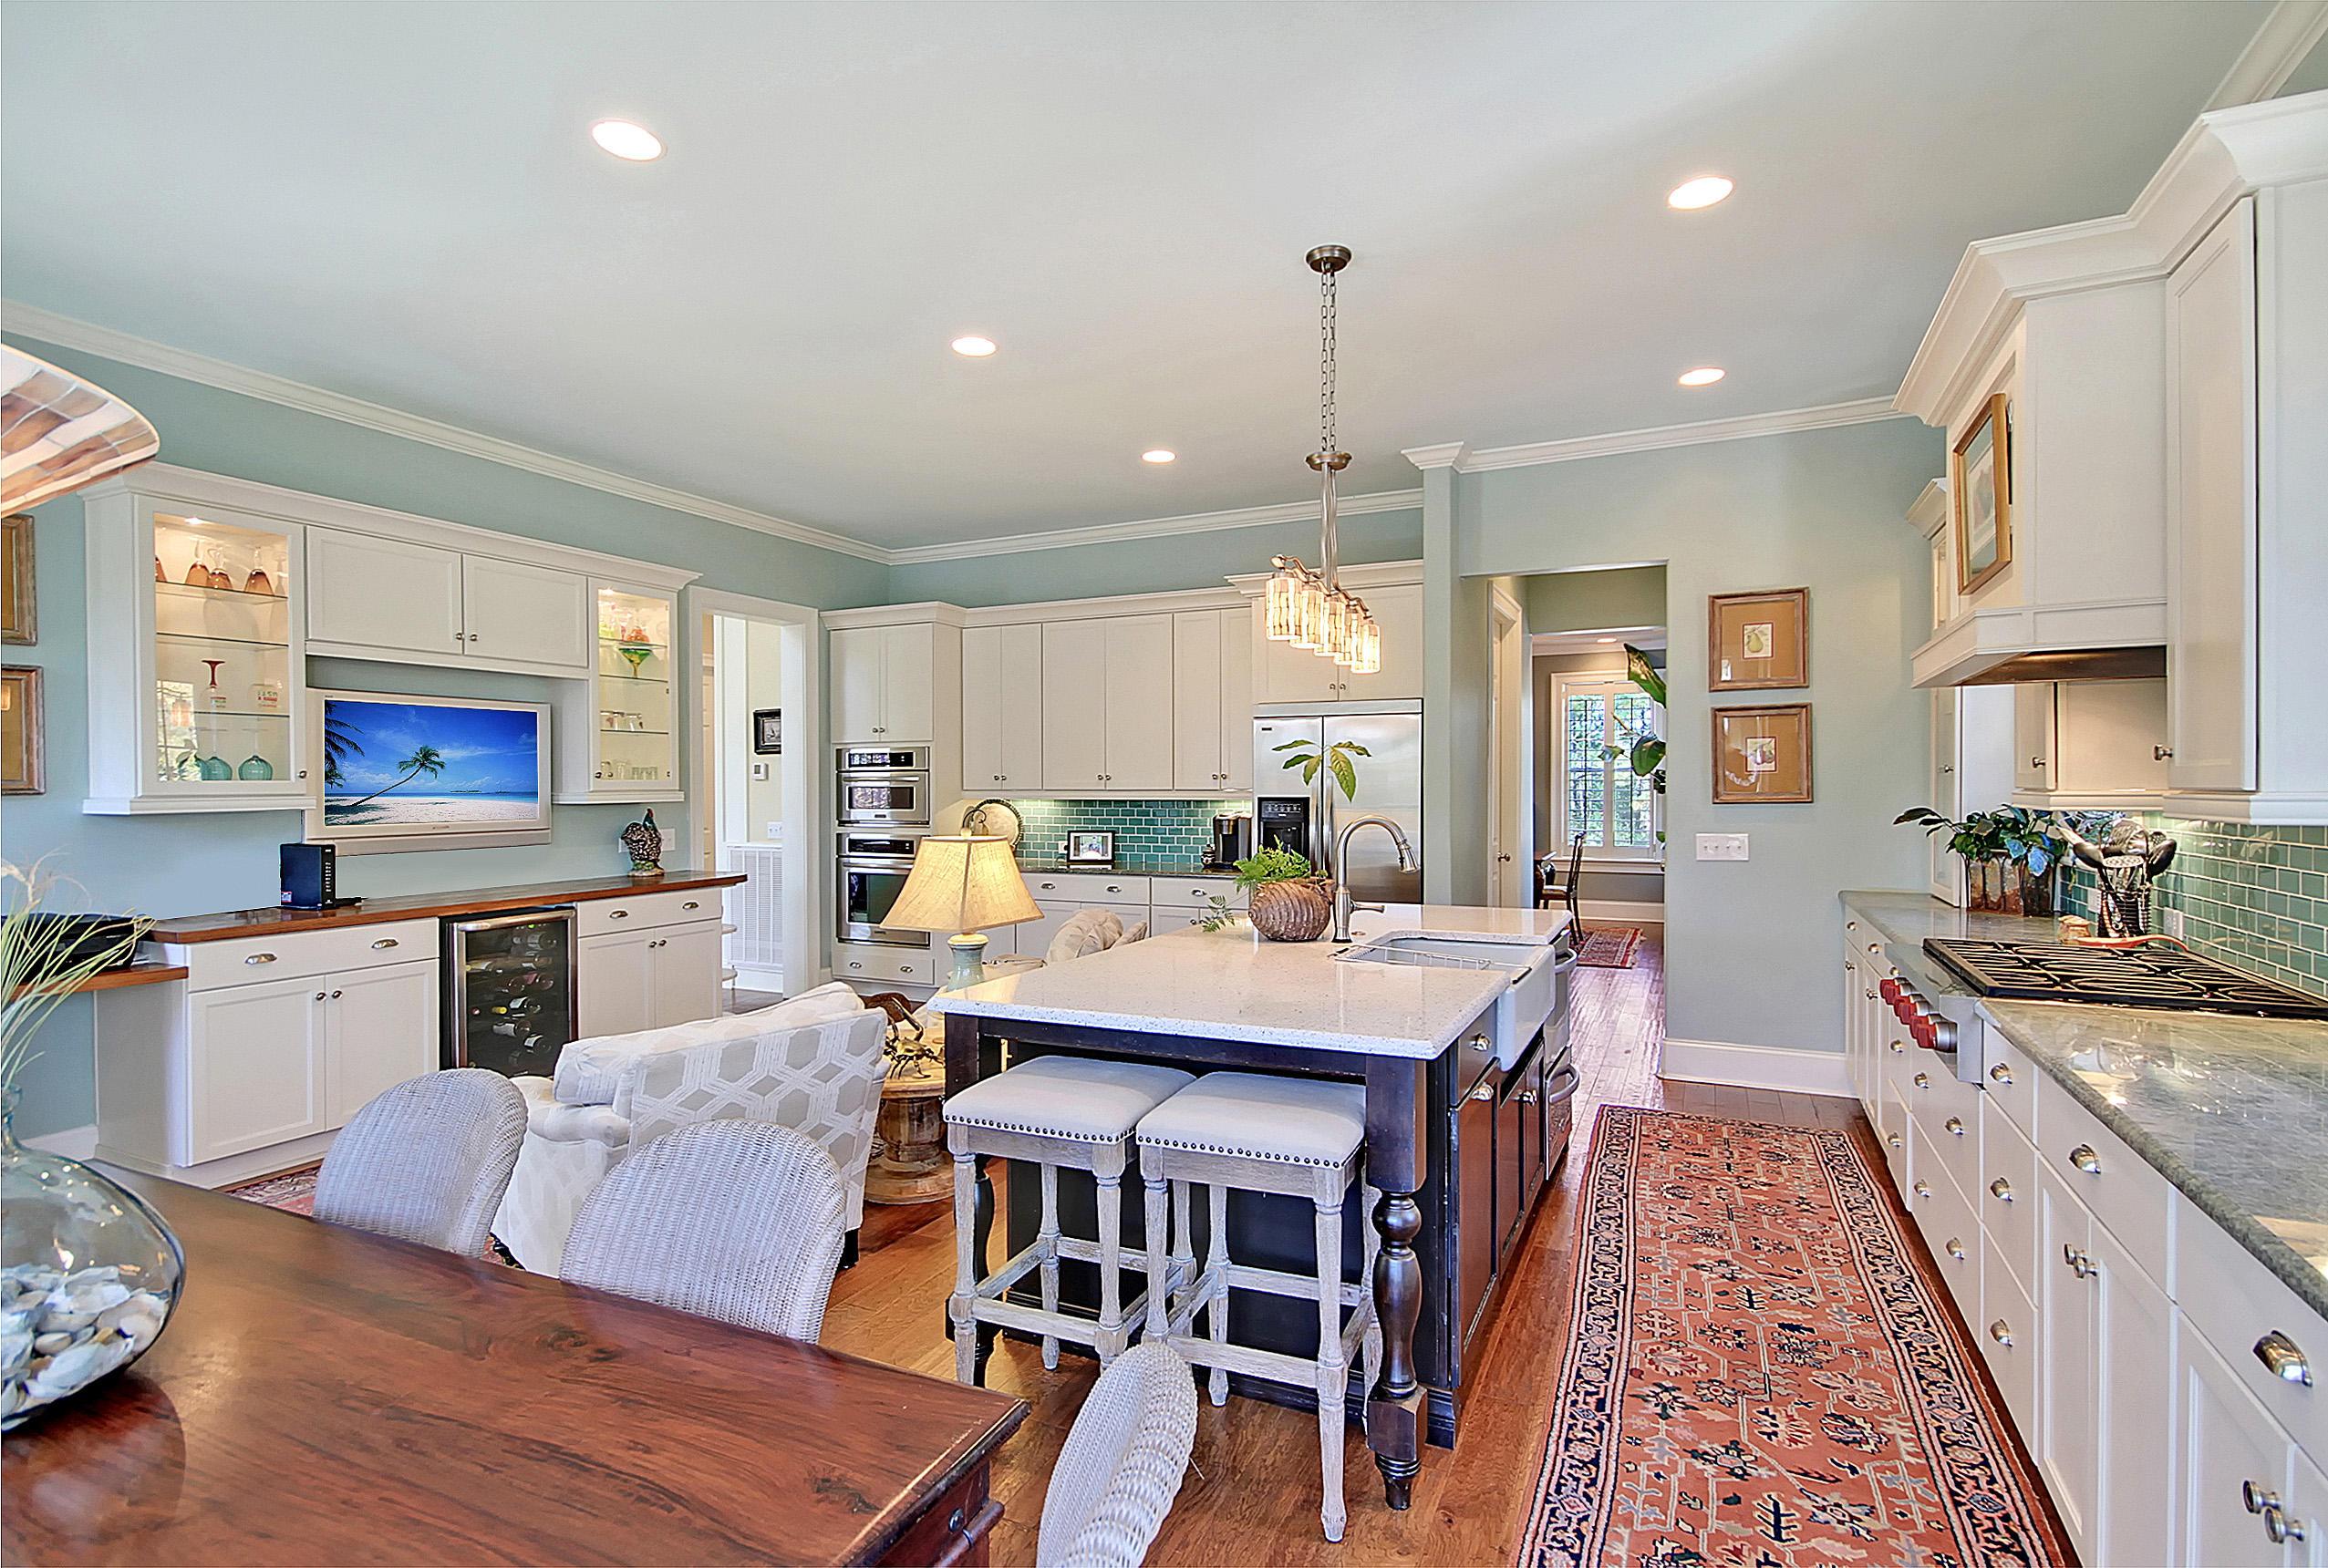 Rivertowne Country Club Homes For Sale - 2601 Kiln Creek, Mount Pleasant, SC - 2